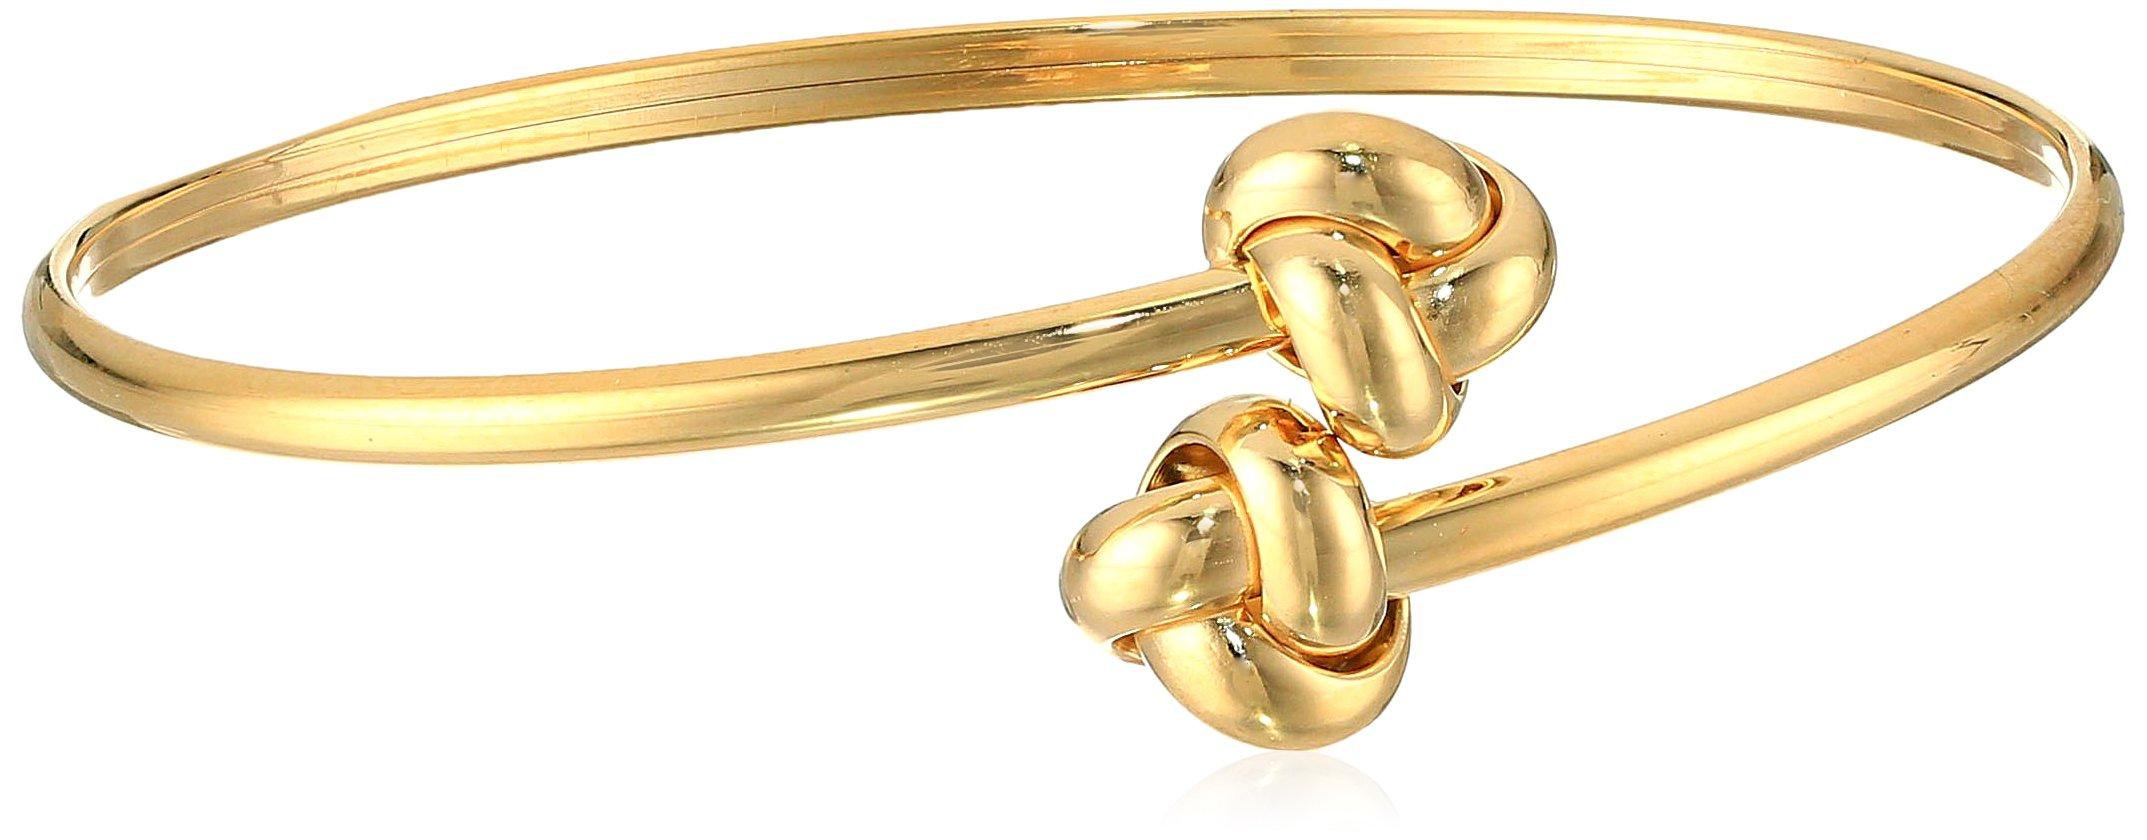 14k Yellow Gold Double-Knot Bangle Bracelet